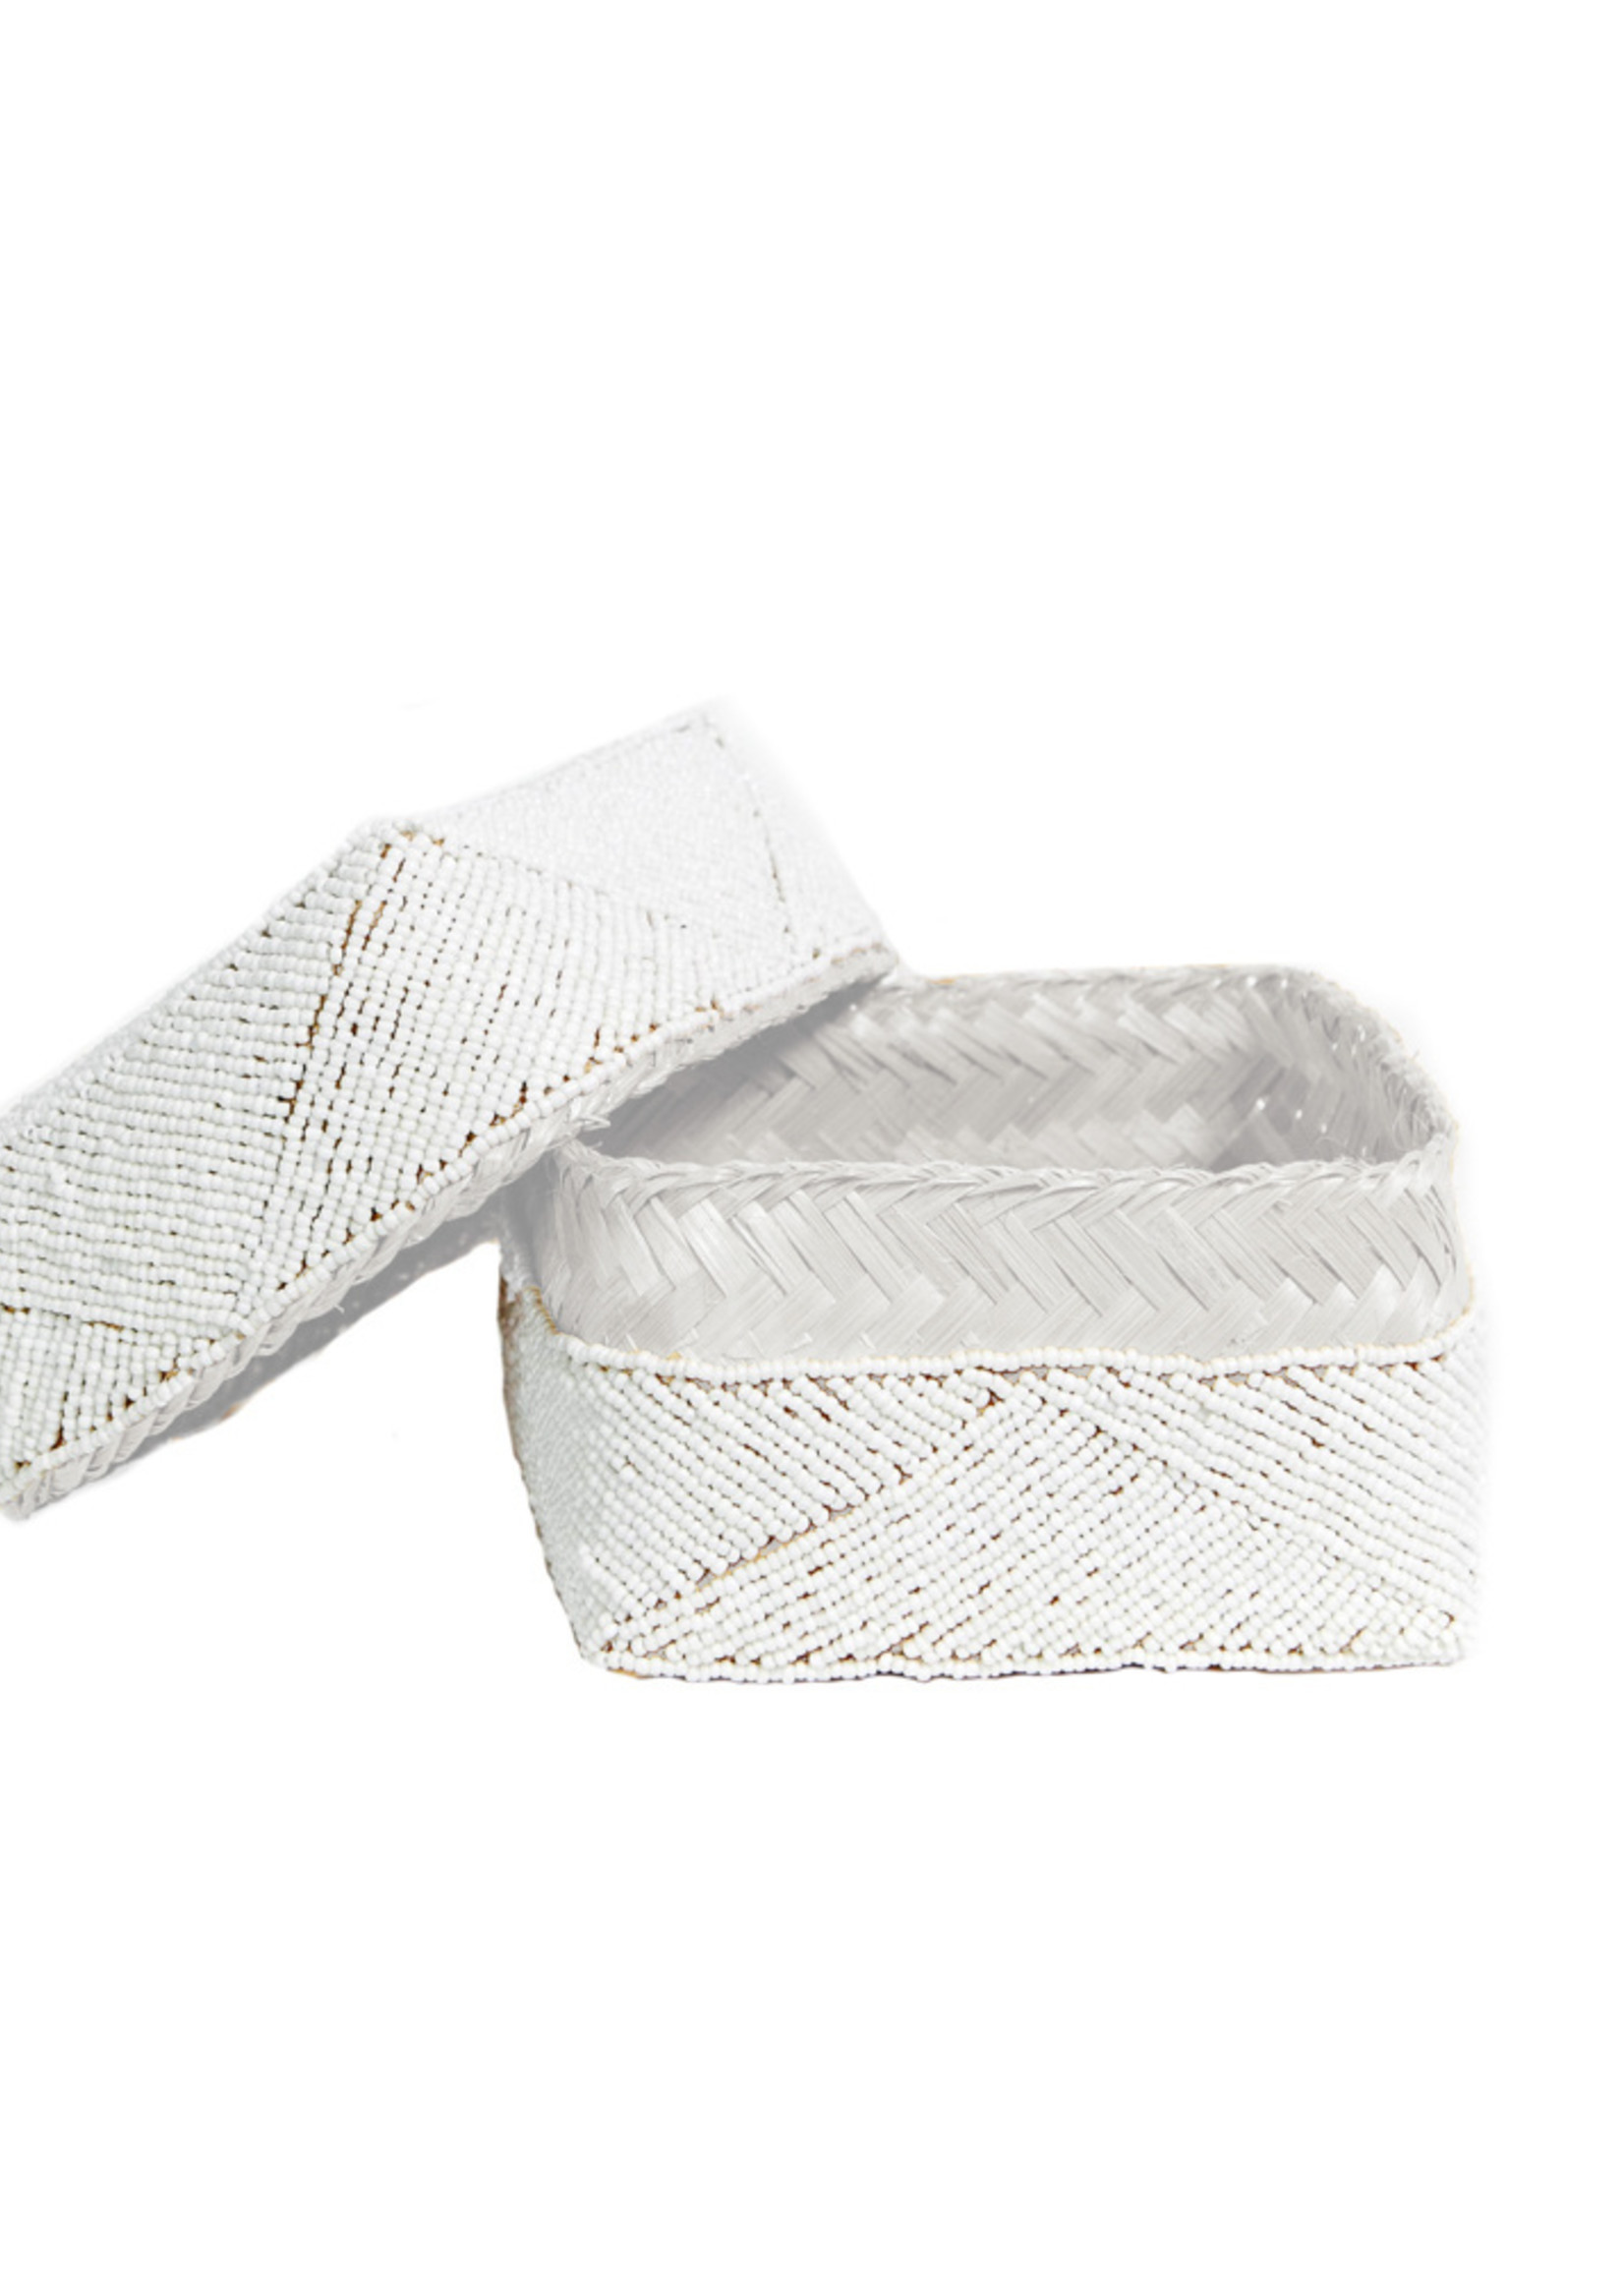 The Beaded Basket - White - SET3